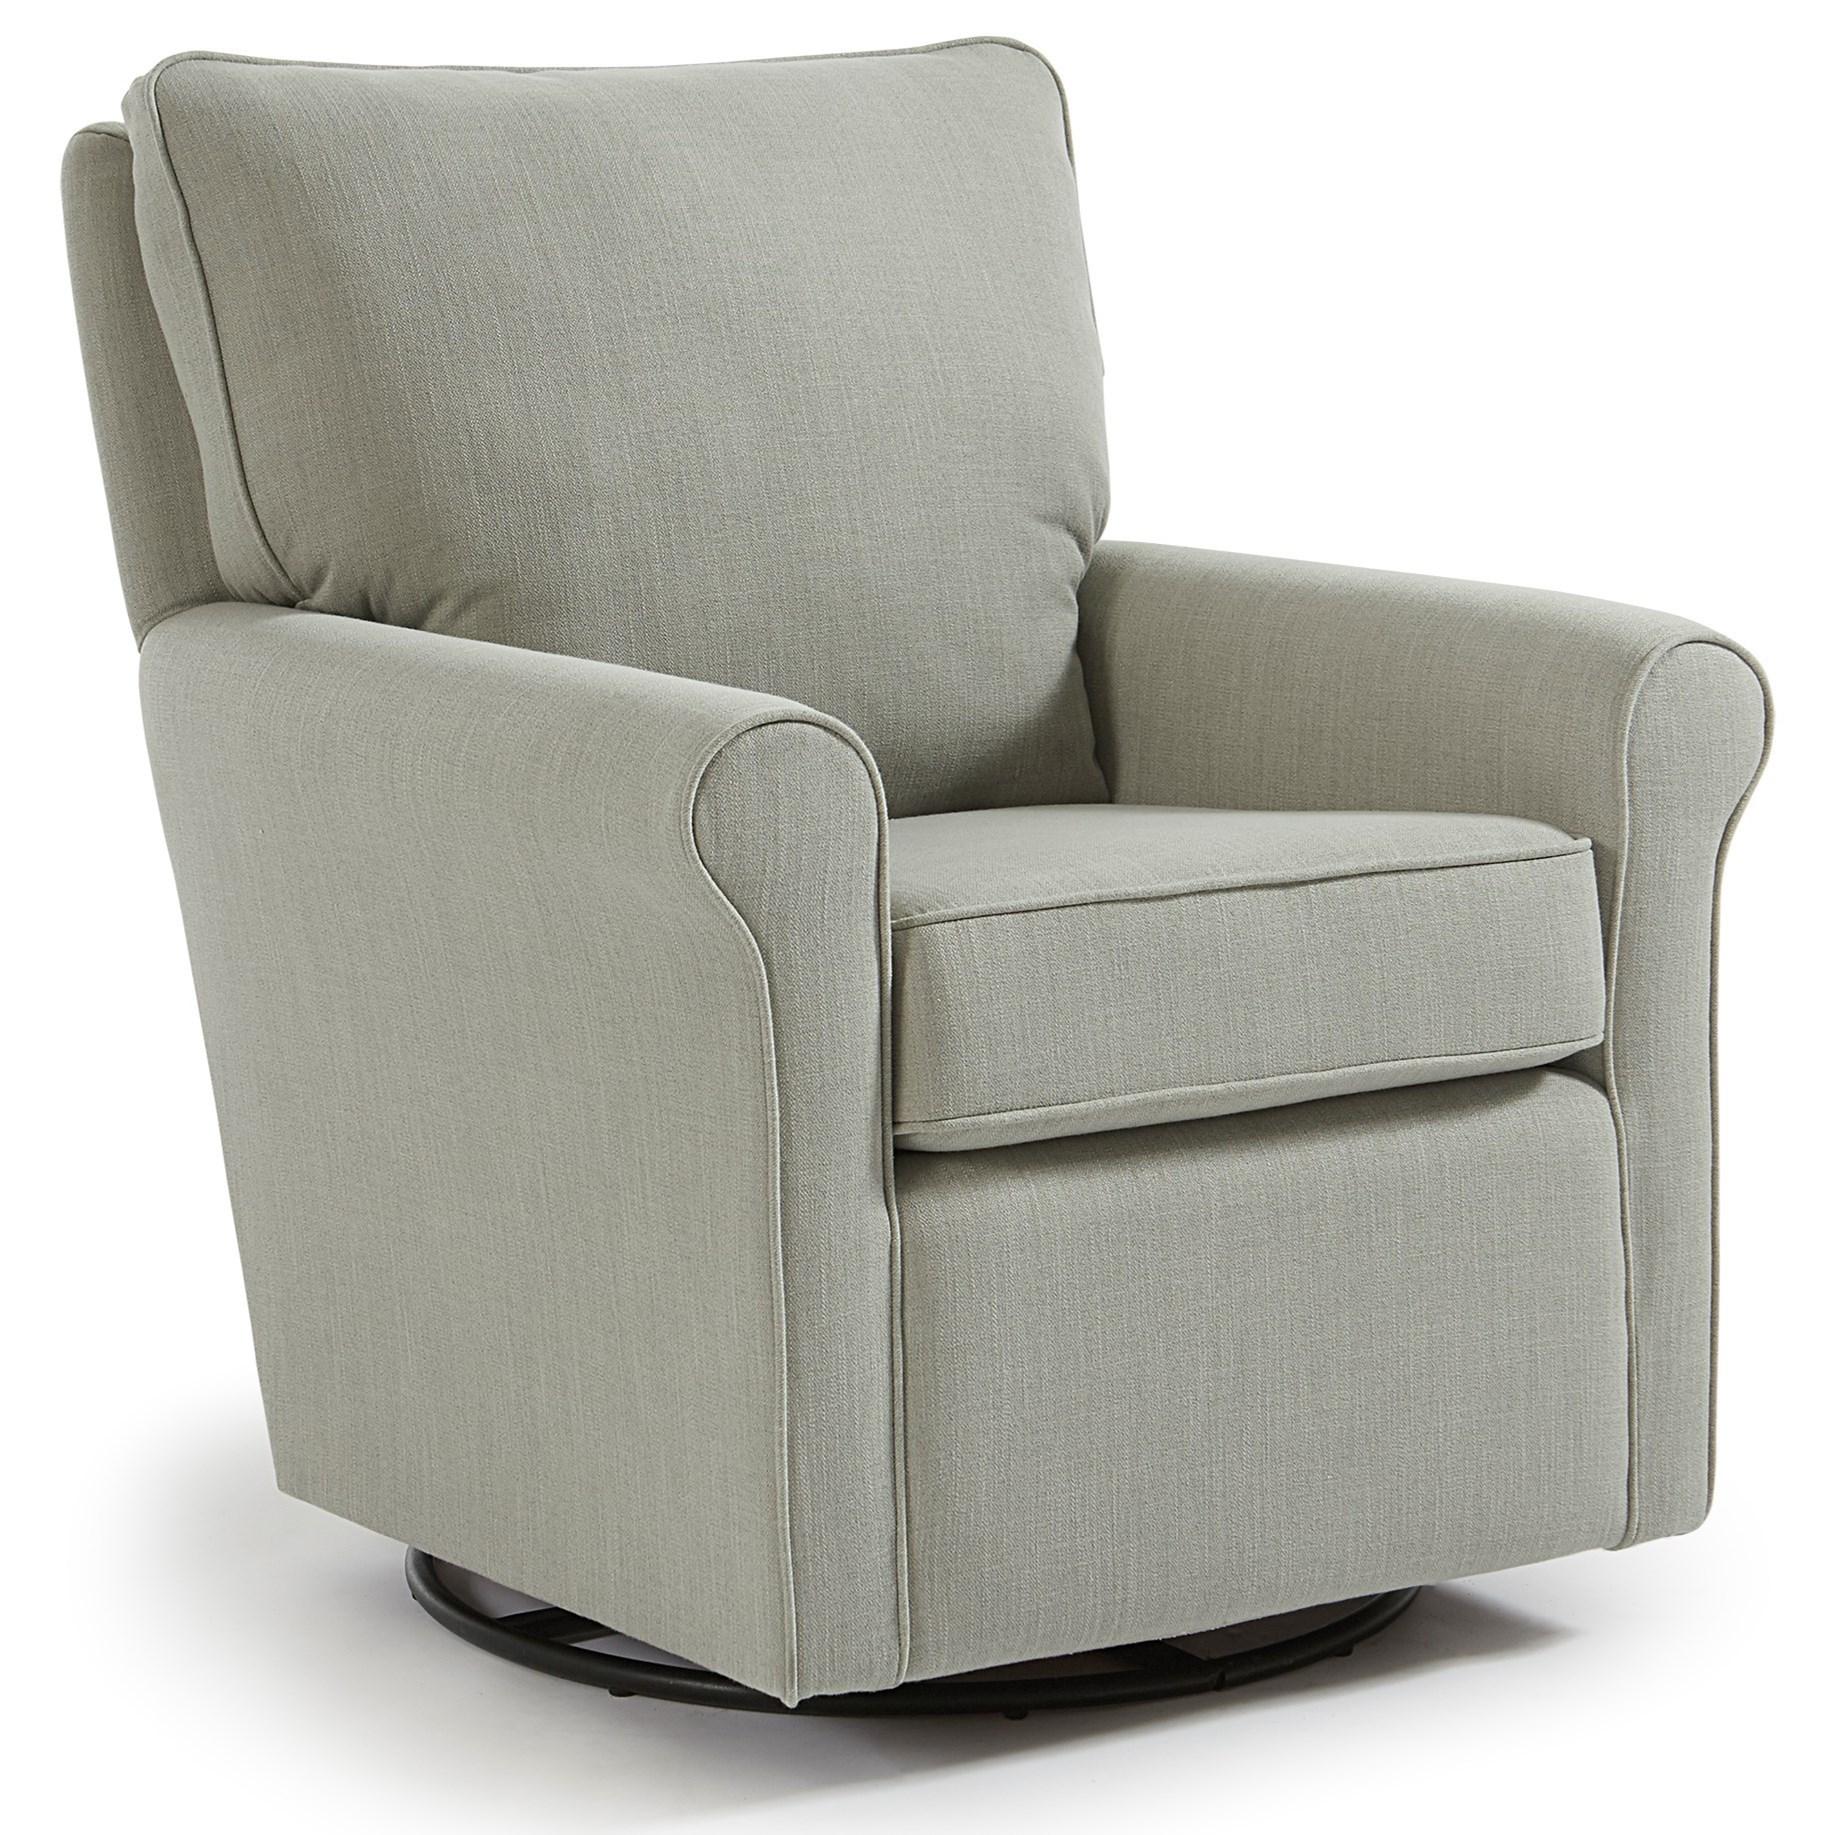 Genial Best Home Furnishings Kacey Casual Swivel Glider Chair